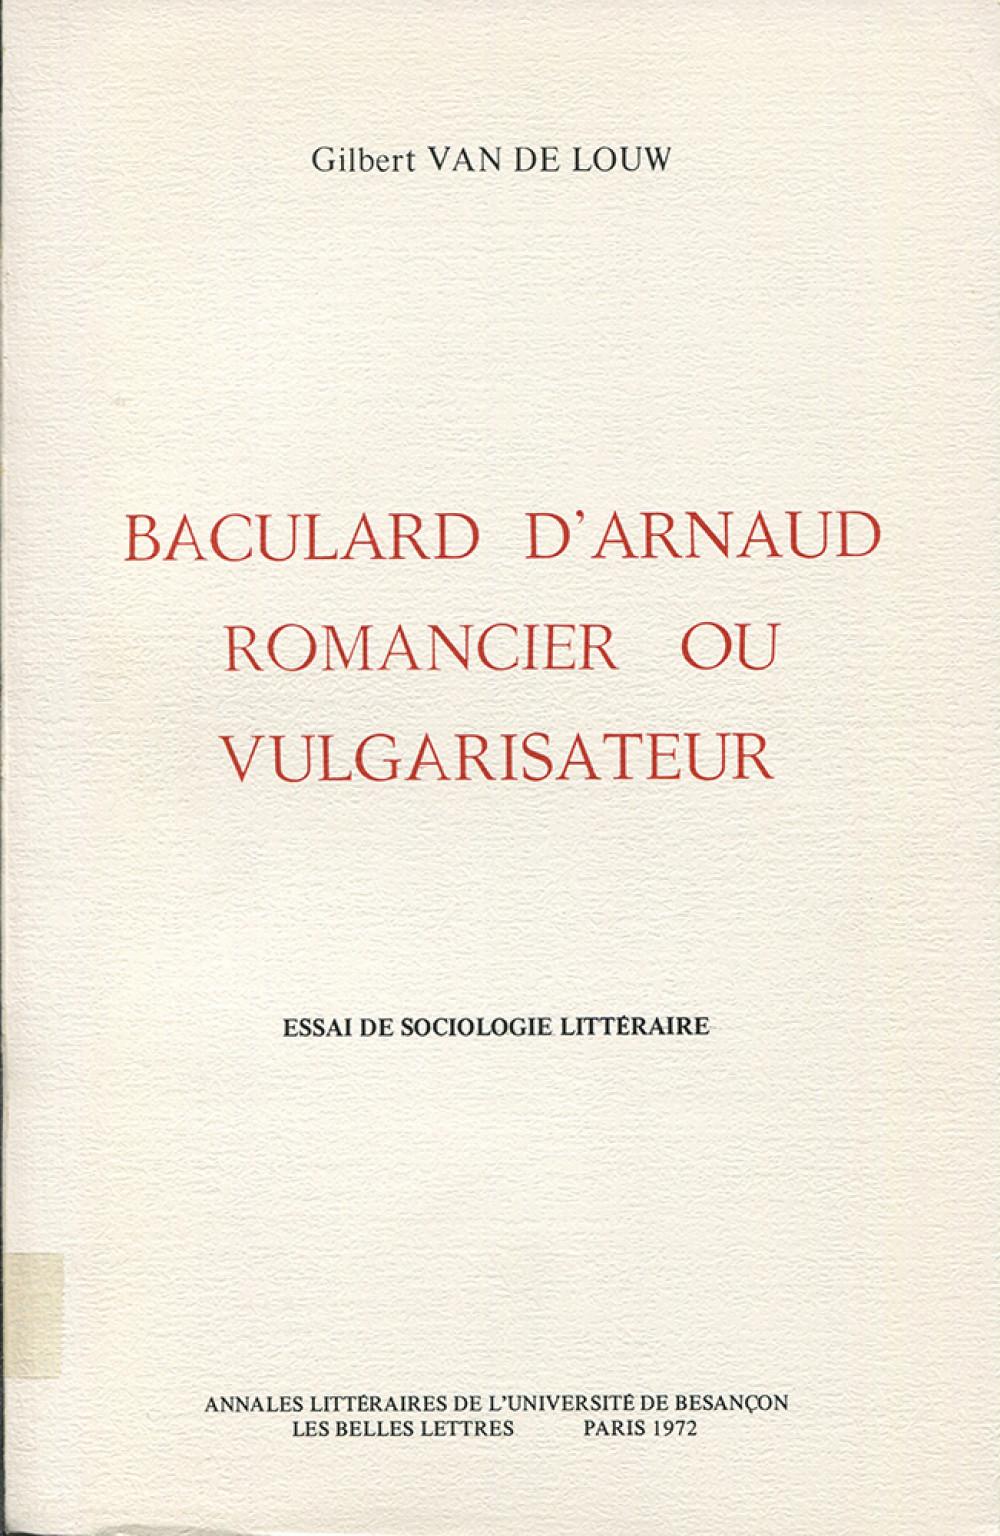 Baculard d'Arnaud. Romancier ou vulgarisateur